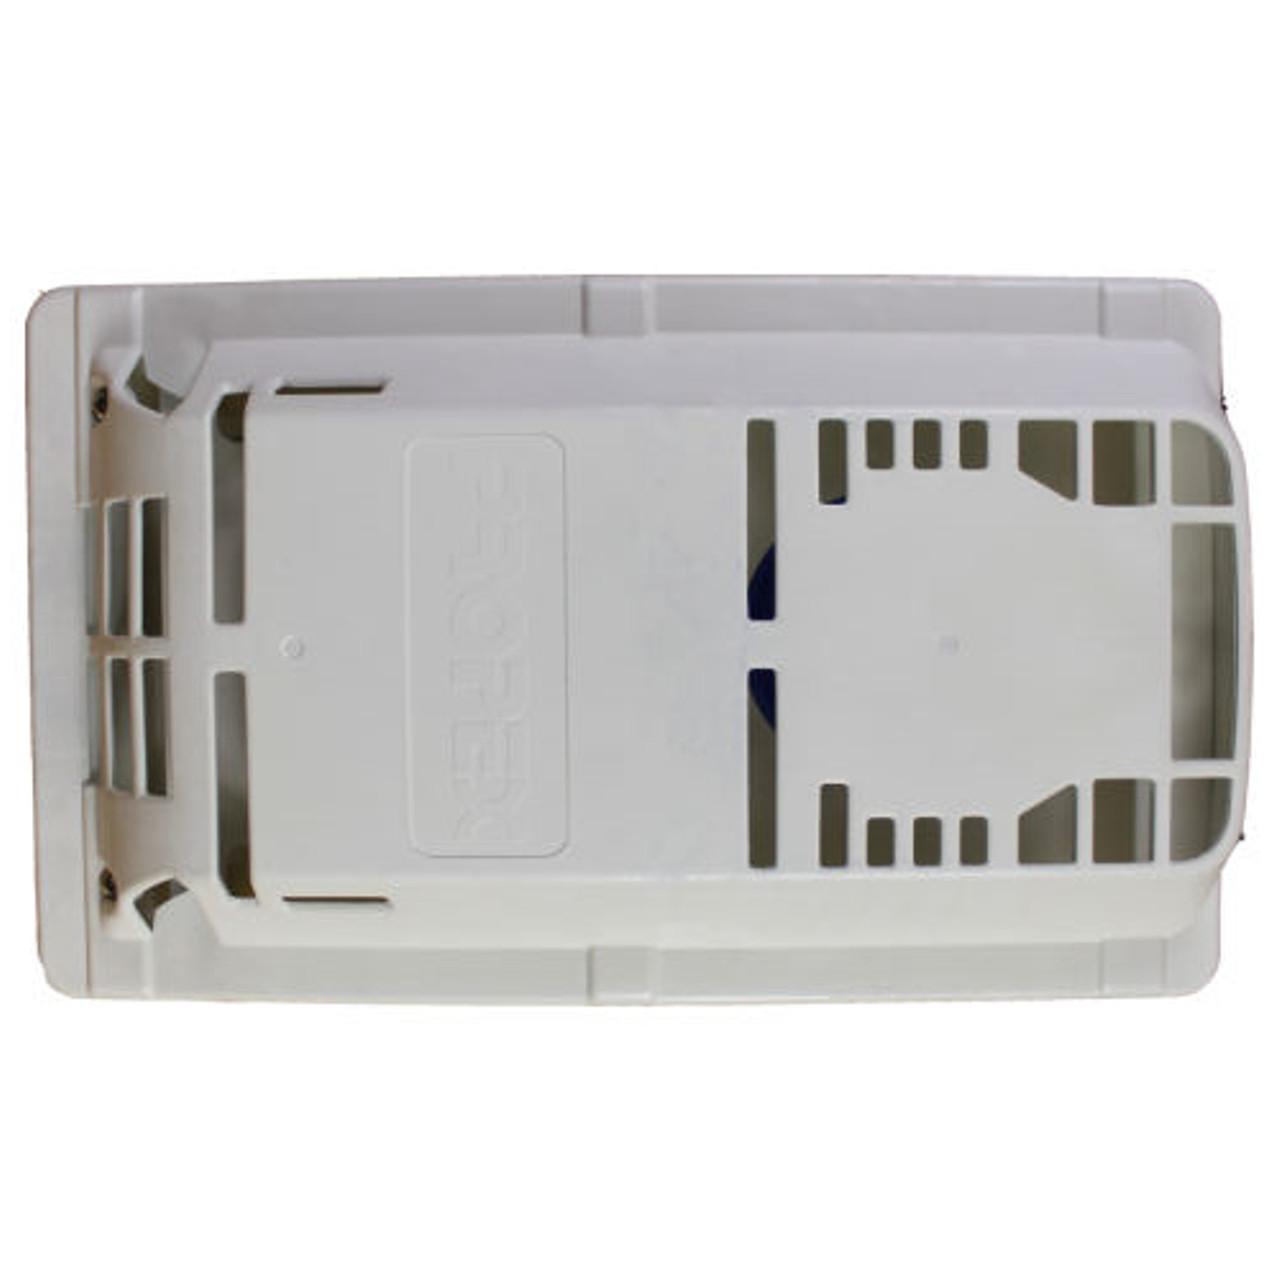 Propex Malaga Water Heater Flue